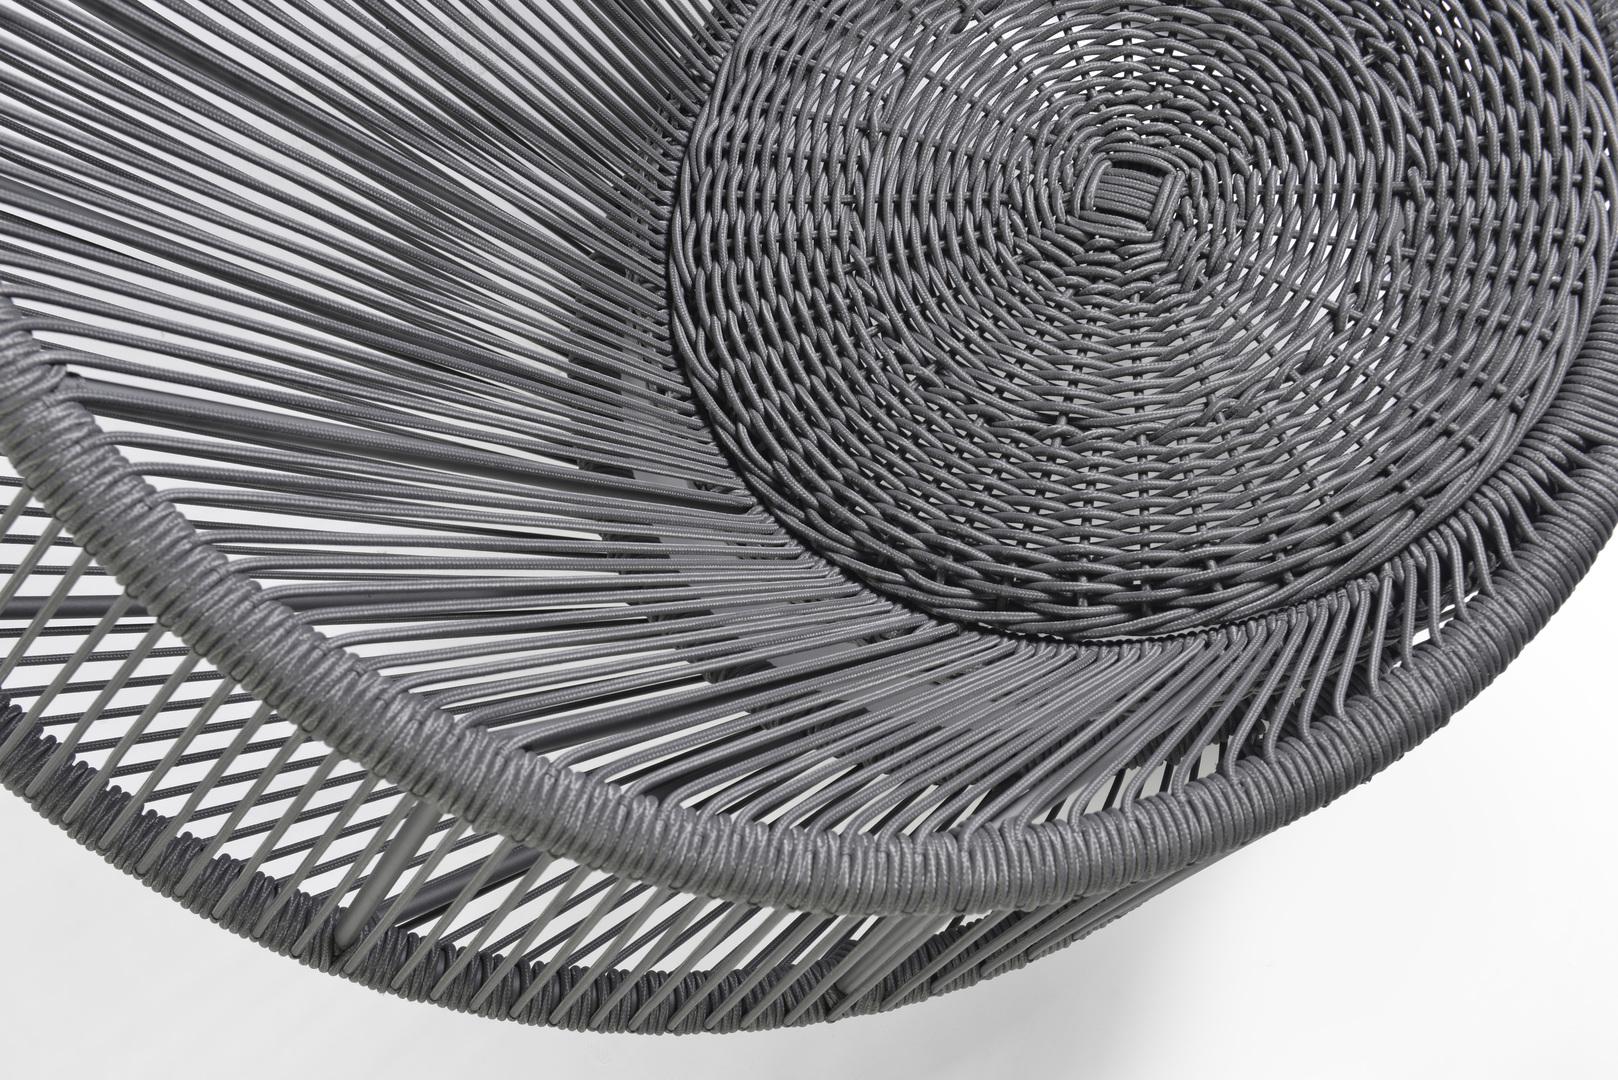 2018 Borek Ardenza rope detail Monsaraz lounge chair 4410 dark grey (2) Maarten Olden.jpg